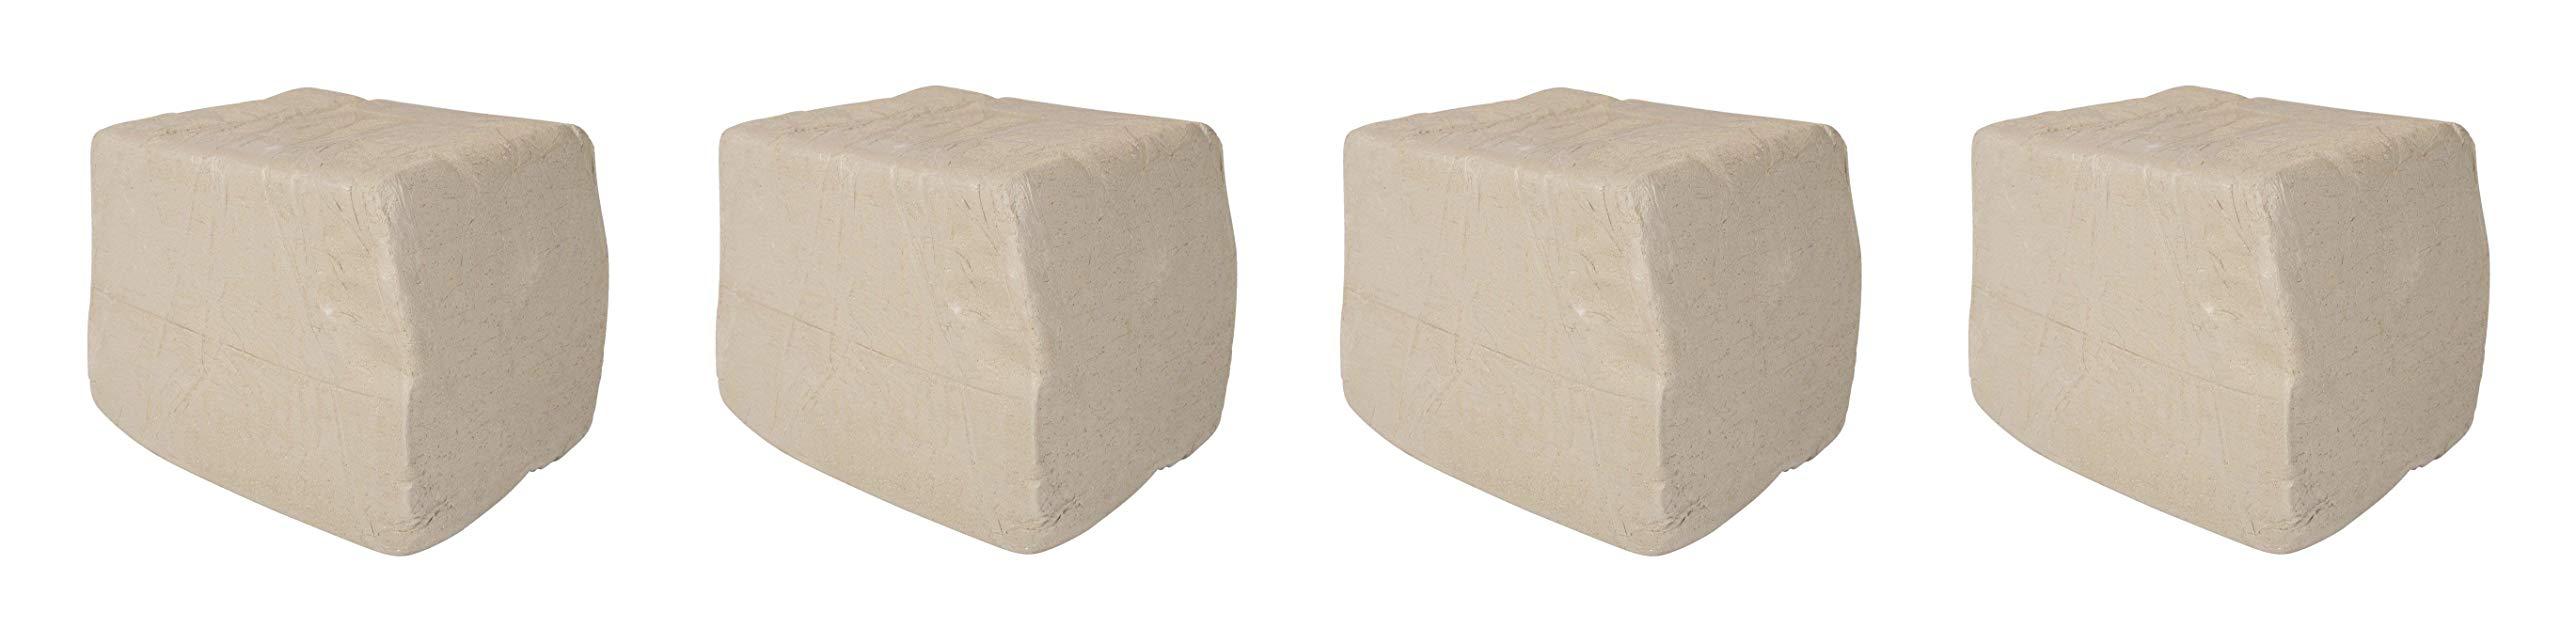 AMACO 351458 Low Fire Moist Sculpture Raku Clay, White, 27 (Pack of 4)